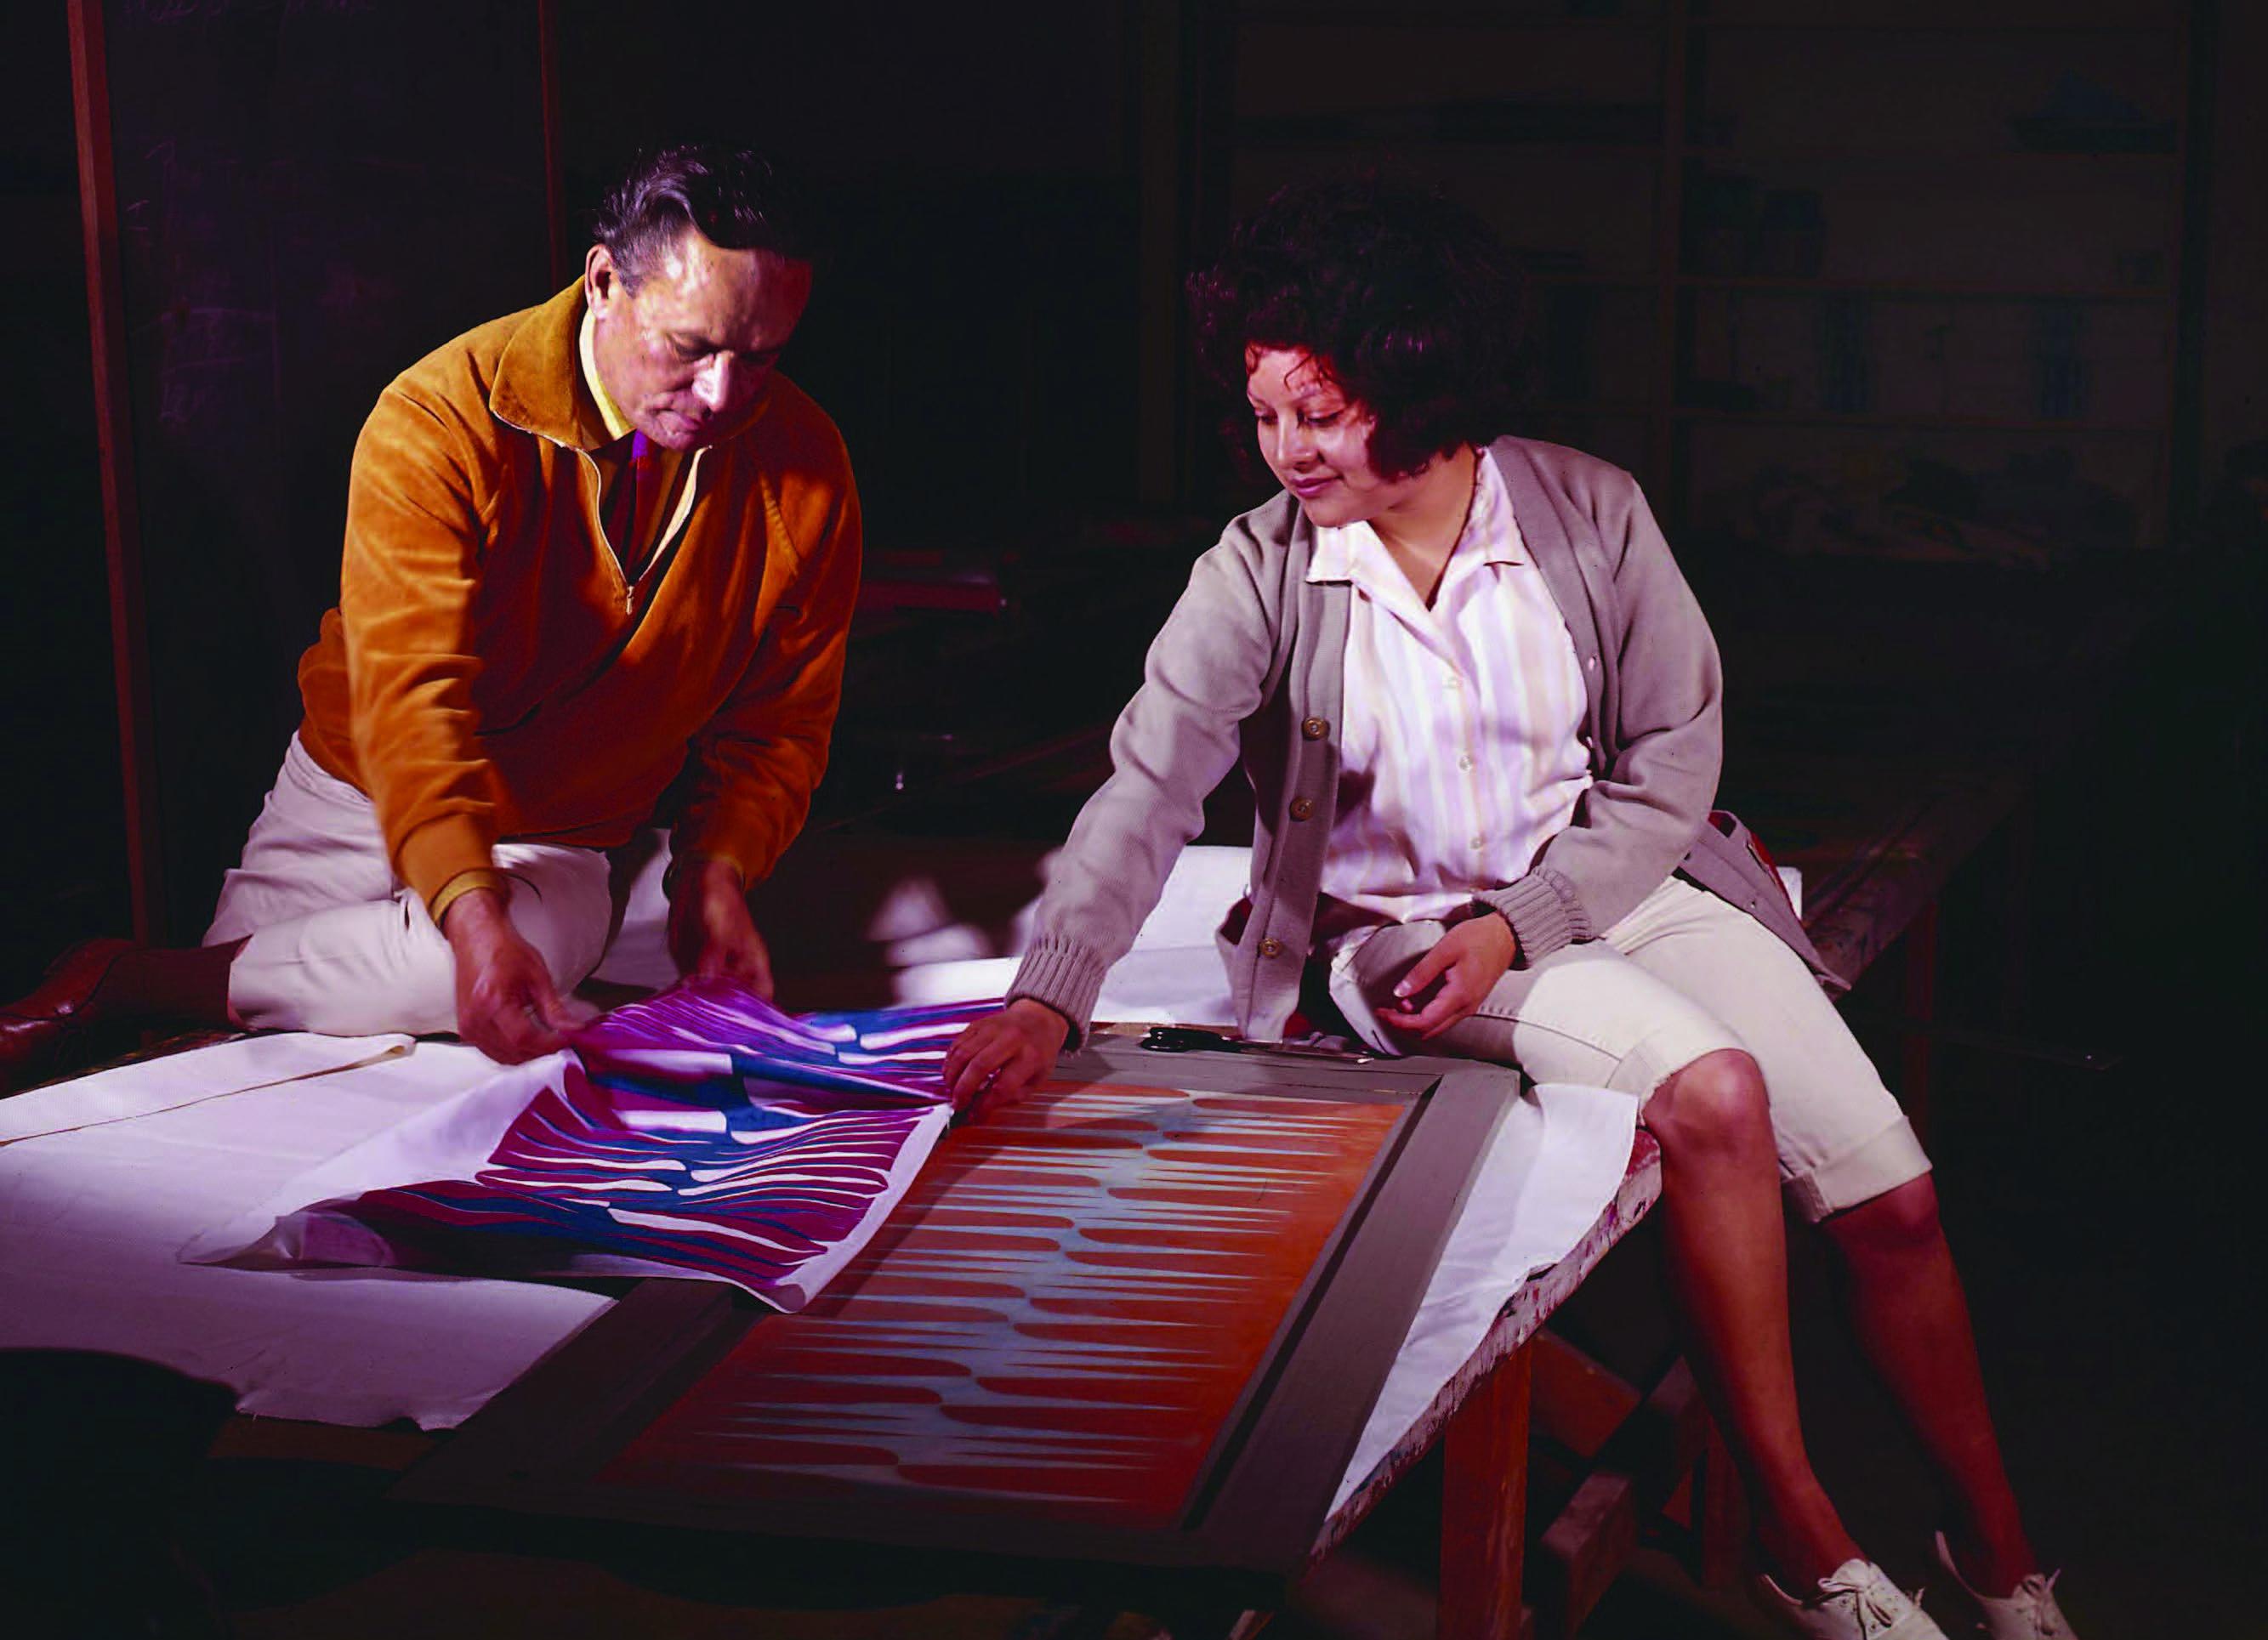 Lloyd Kiva New: Art, Design, and Influence